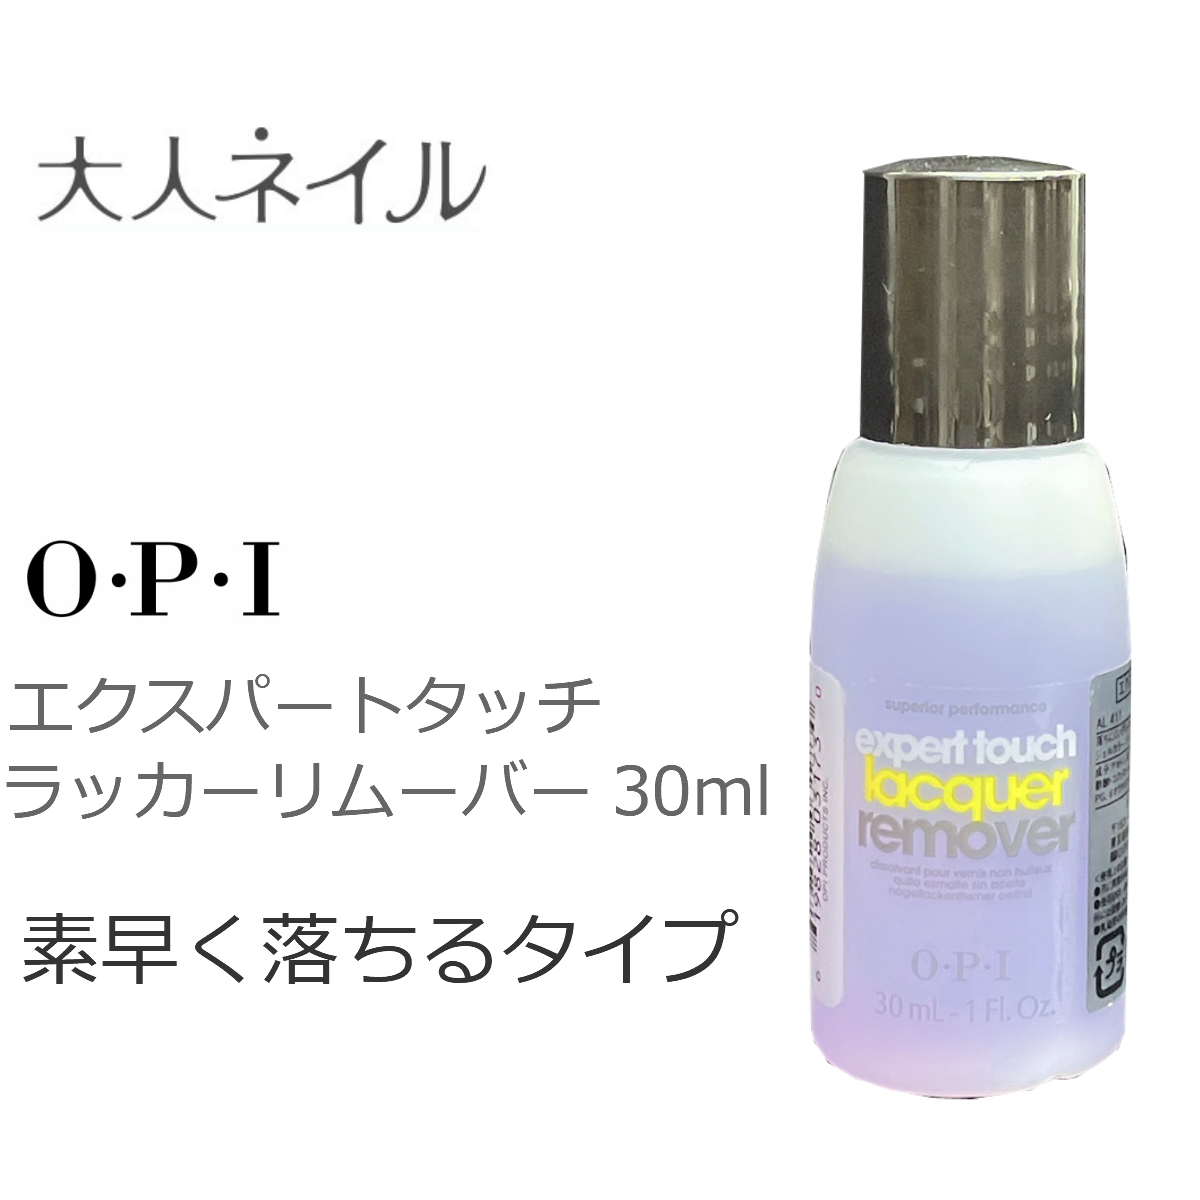 OPI(オーピーアイ) 除光液 エクスパートタッチラッカーリムーバー 30ml カラー除去 検定